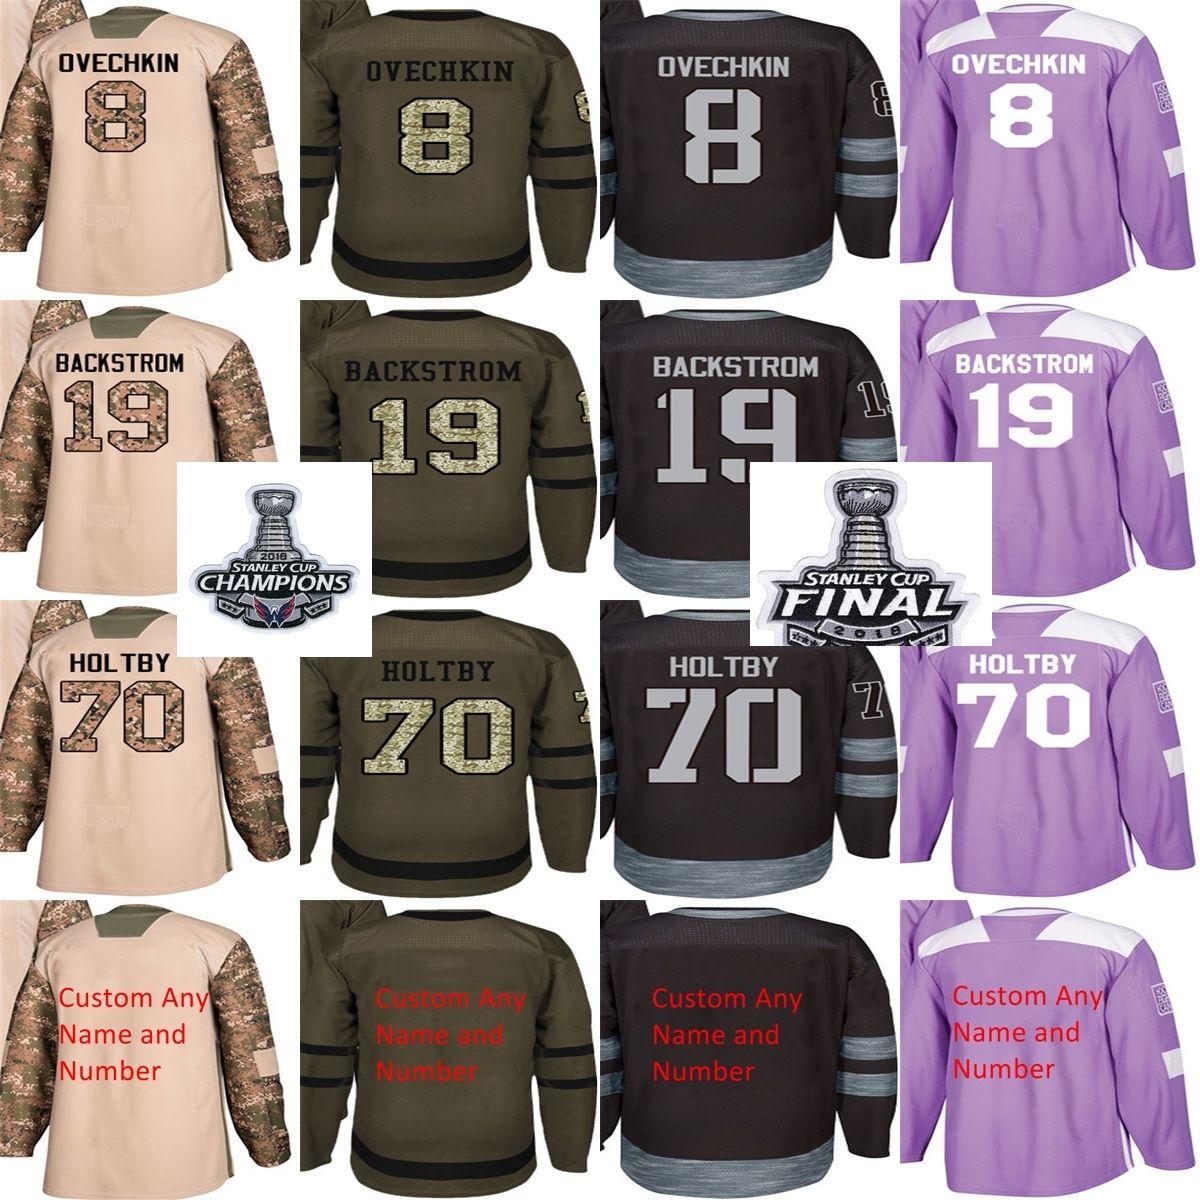 2019 2018 Stanley Cup Champions Final Men Washington Capitals Alex Ovechkin  T.J. Oshie Braden Holtby Backstrom Camo Black Green Hockey Jerseys From  Fanatics ... 698e50bc6